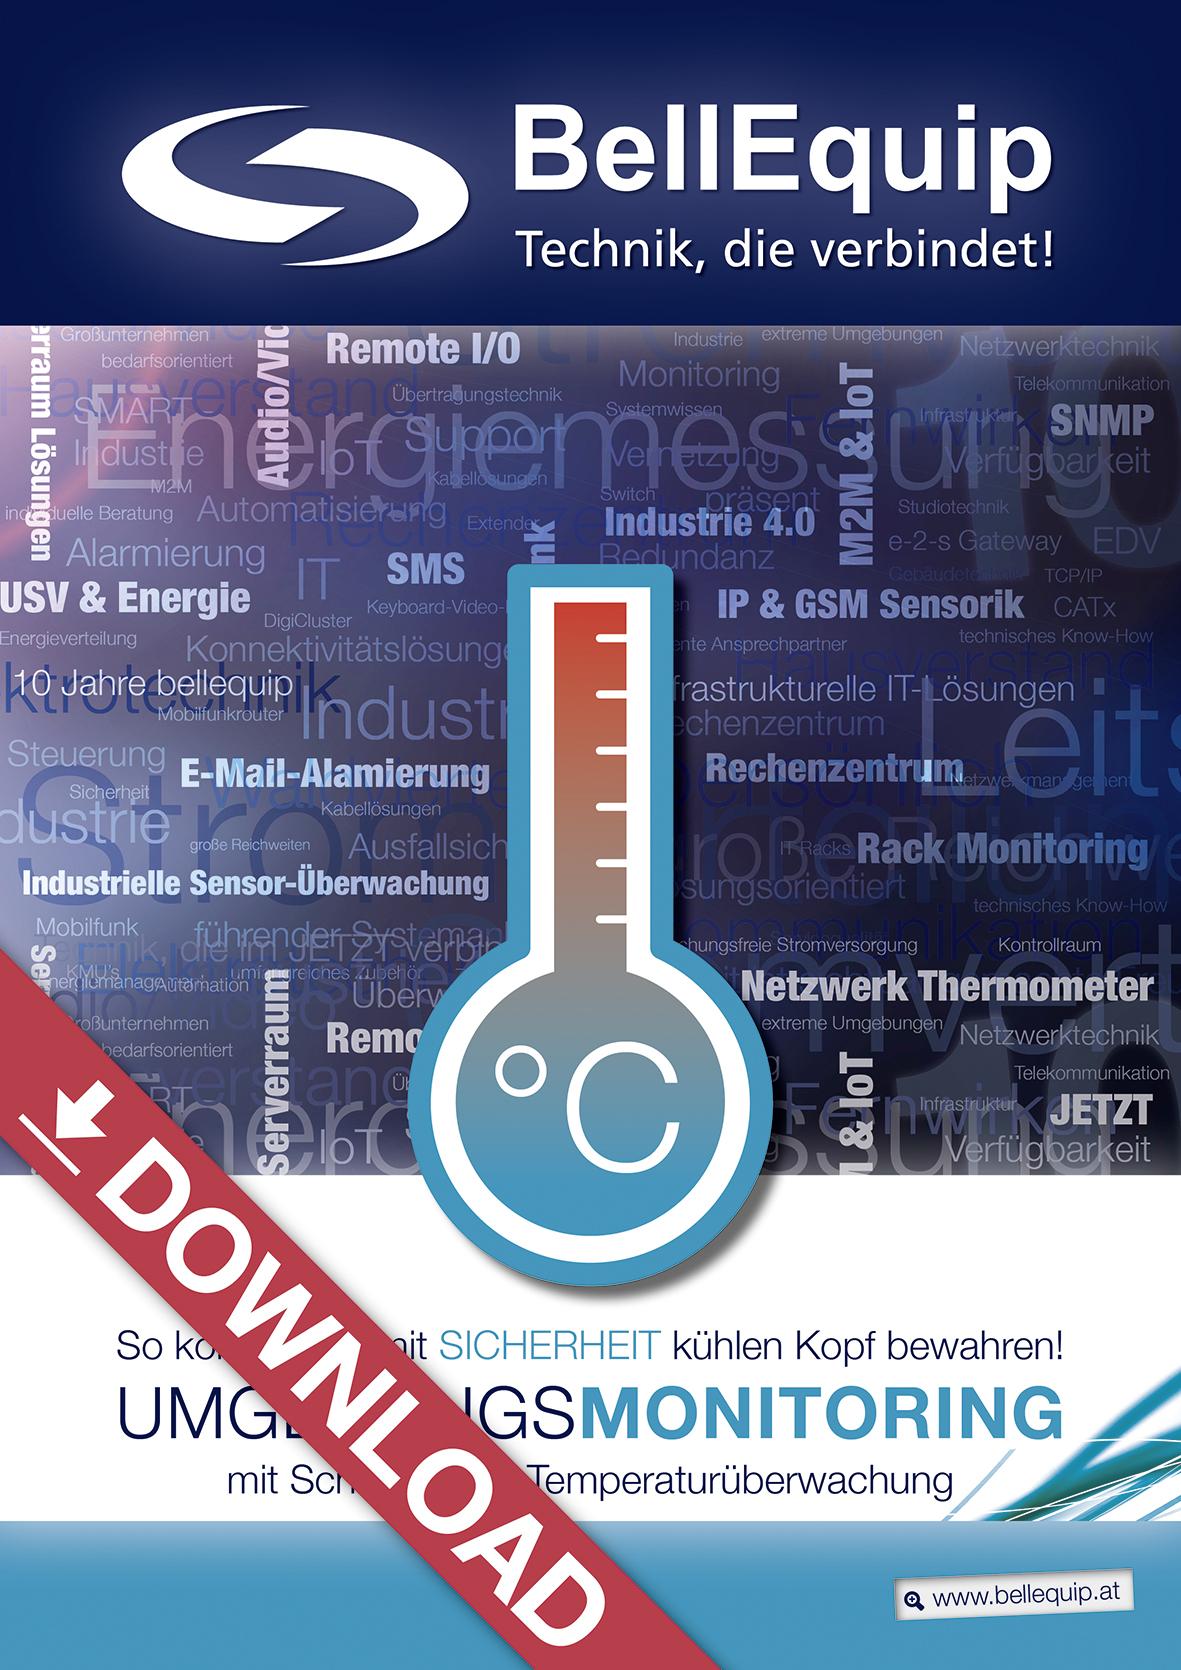 bellequip-umgebungsmonitoring-temperaturueberwachung